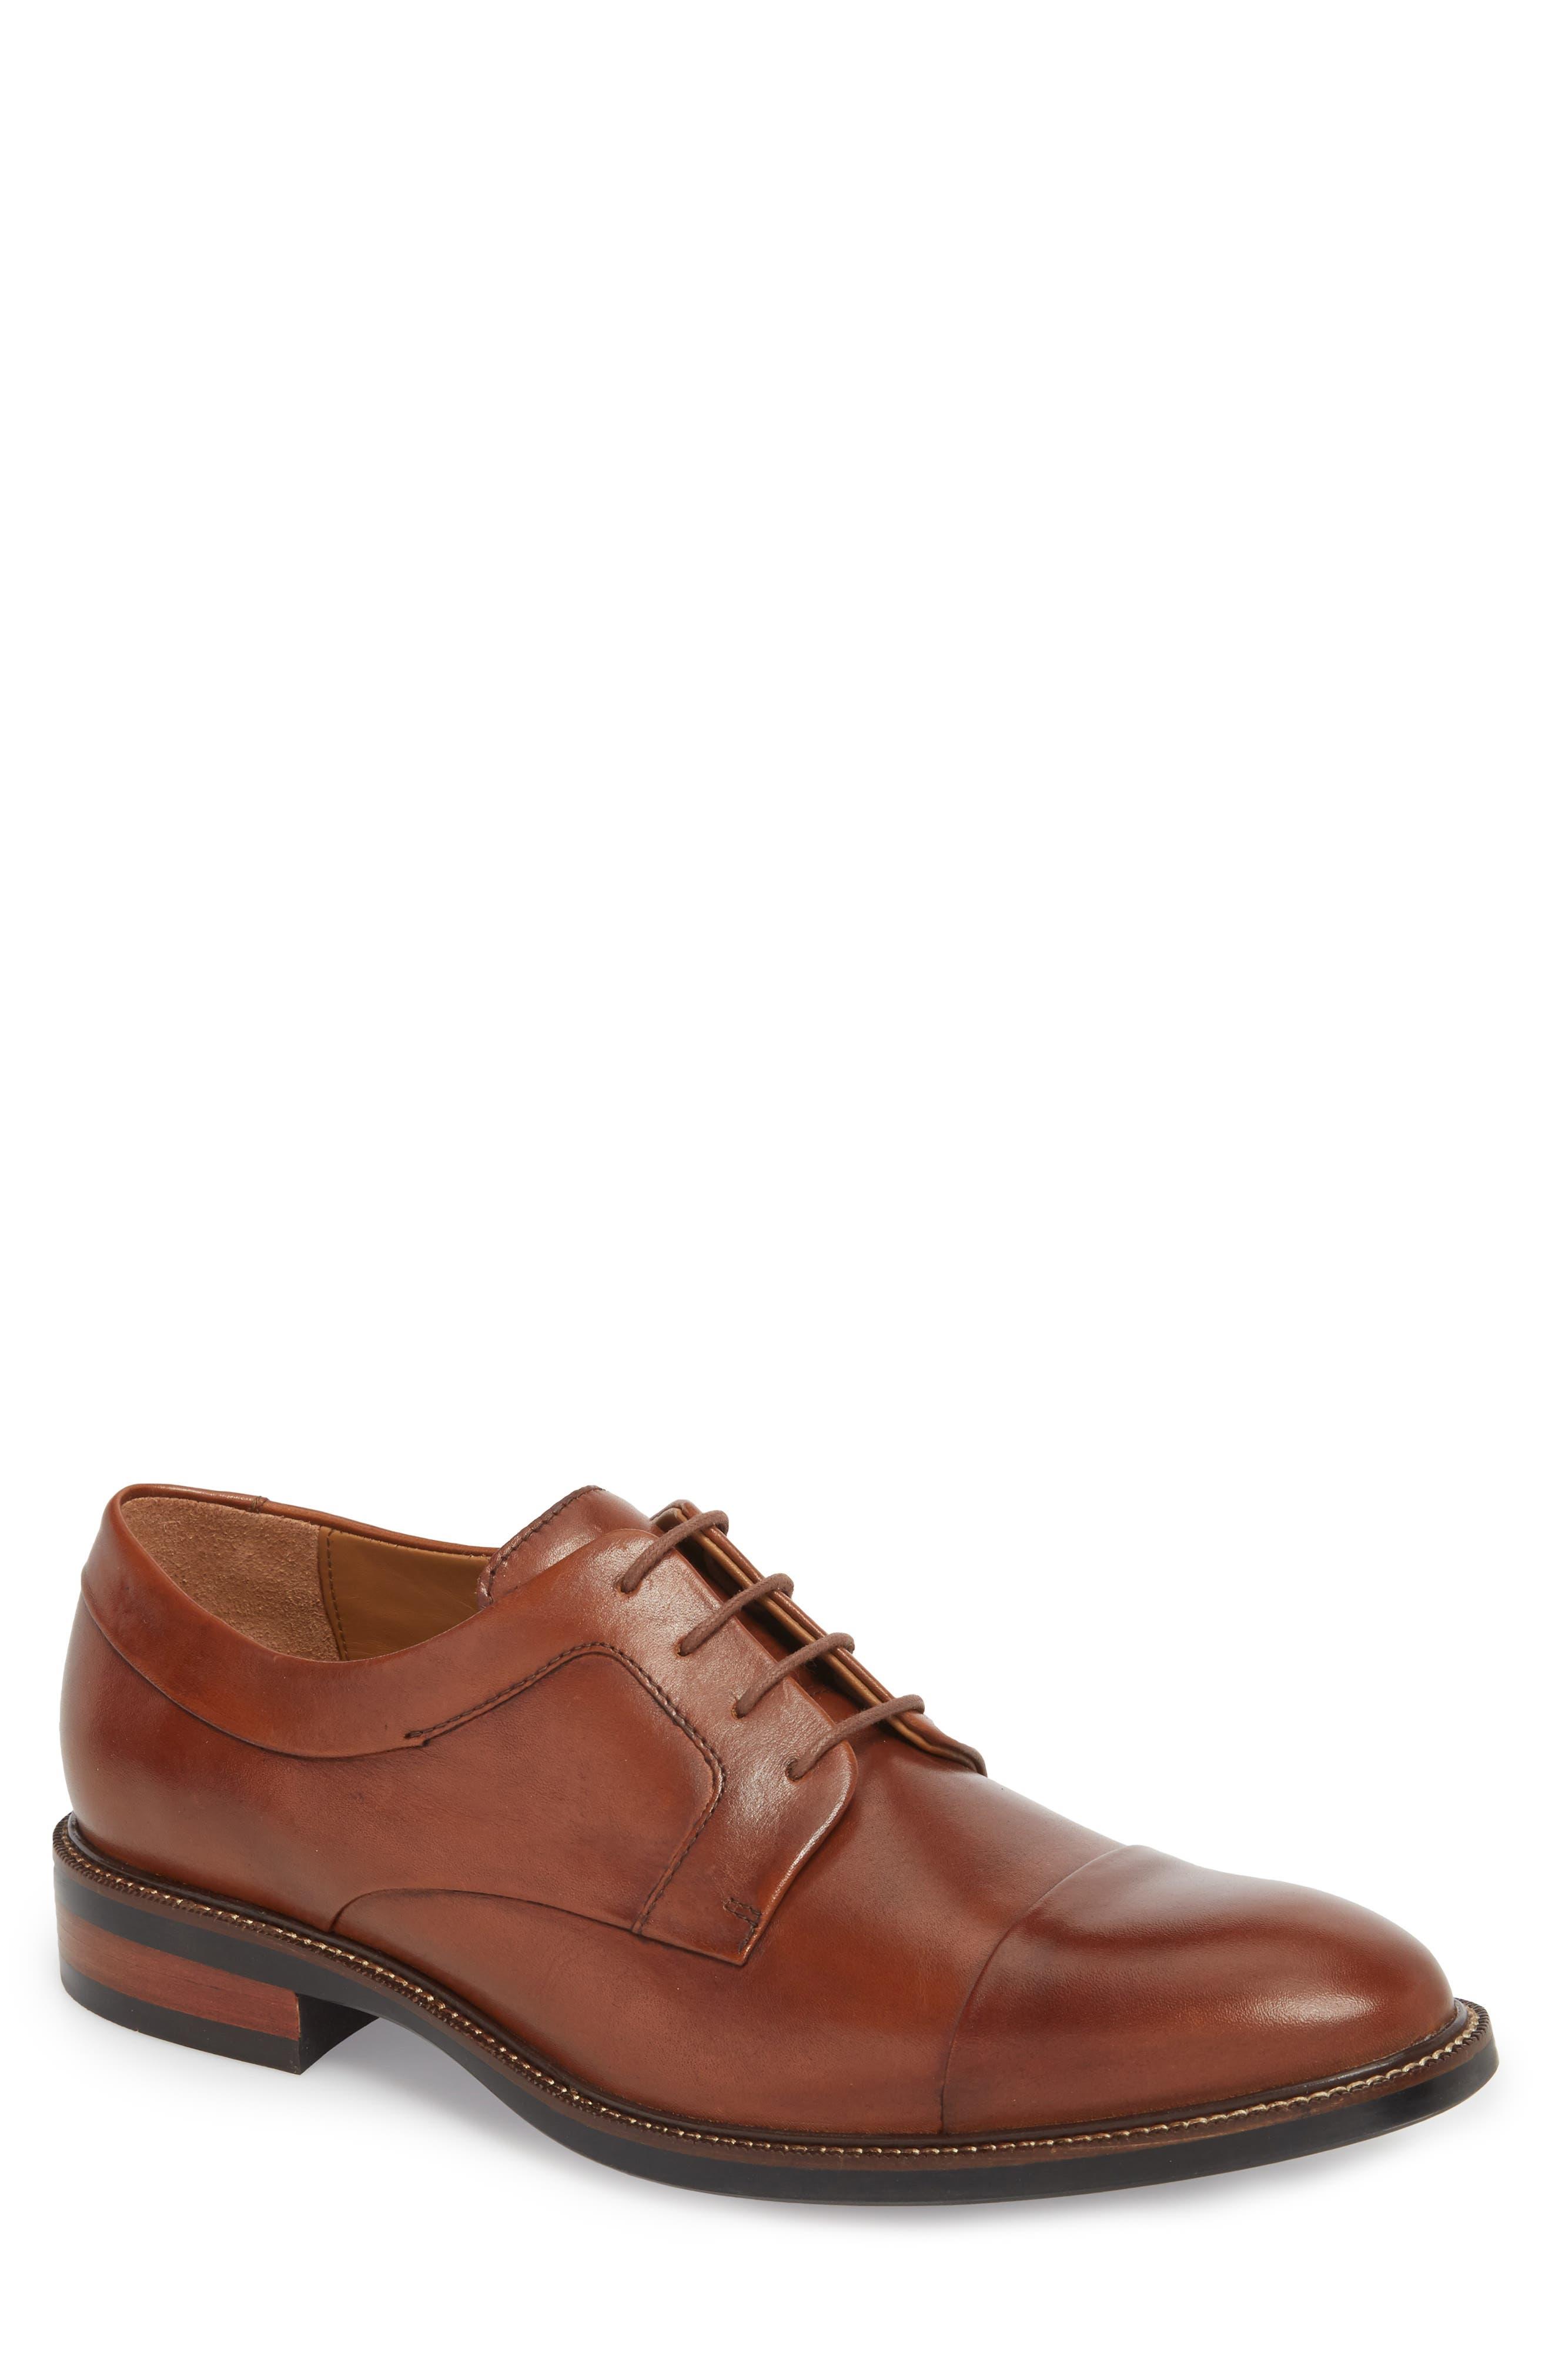 Cole Haan Men/'s Warren Cap Toe Leather Lace-Up Oxfords British Tan